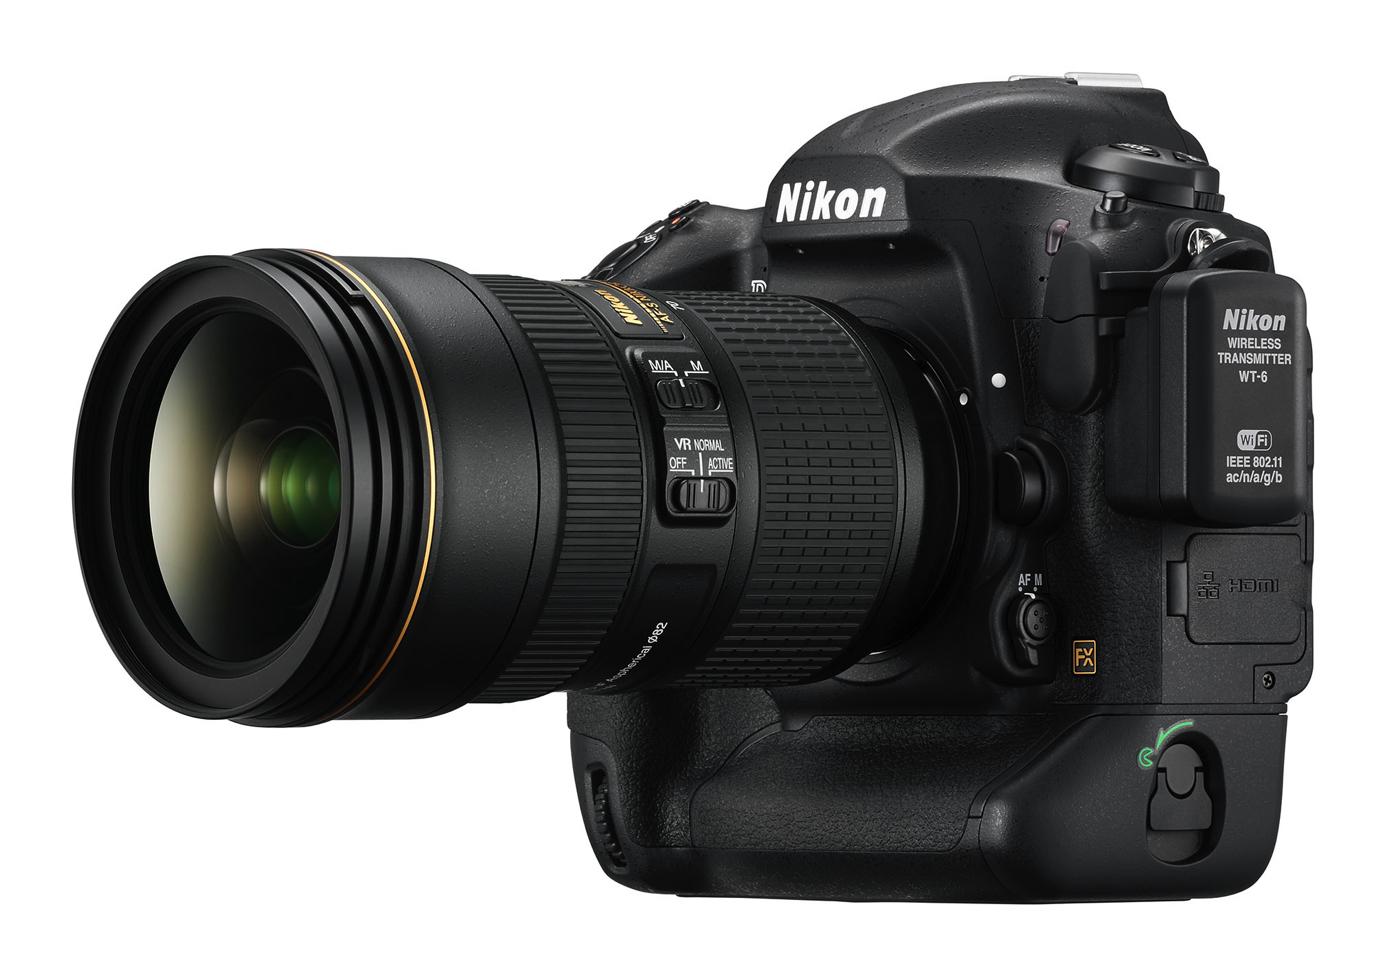 Nikon D5 firmware update version 1.30 released